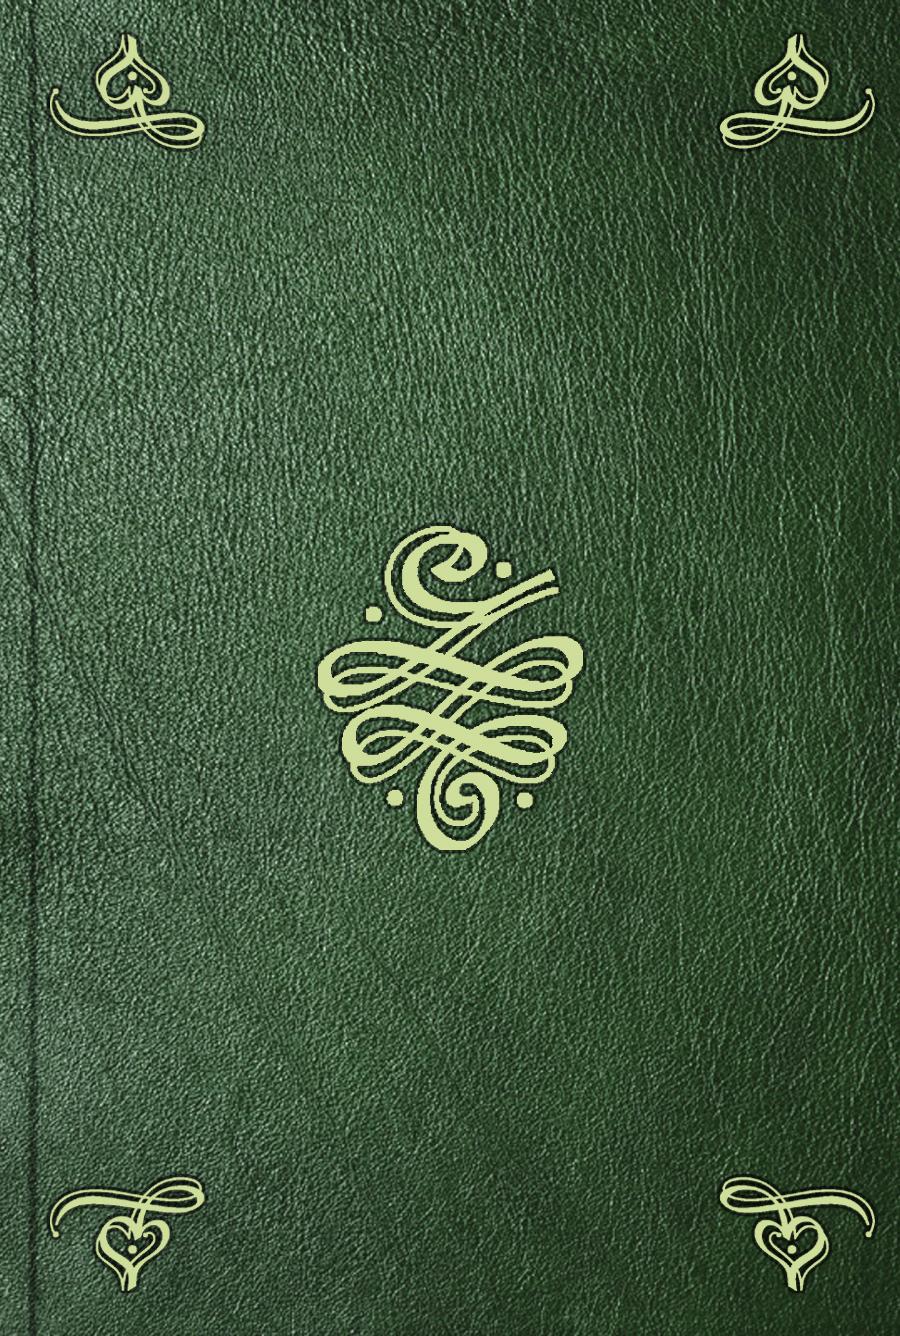 Фото - Рене Декарт Oeuvres de Descartes. T. 7 декарт рене декарт собрание сочинений